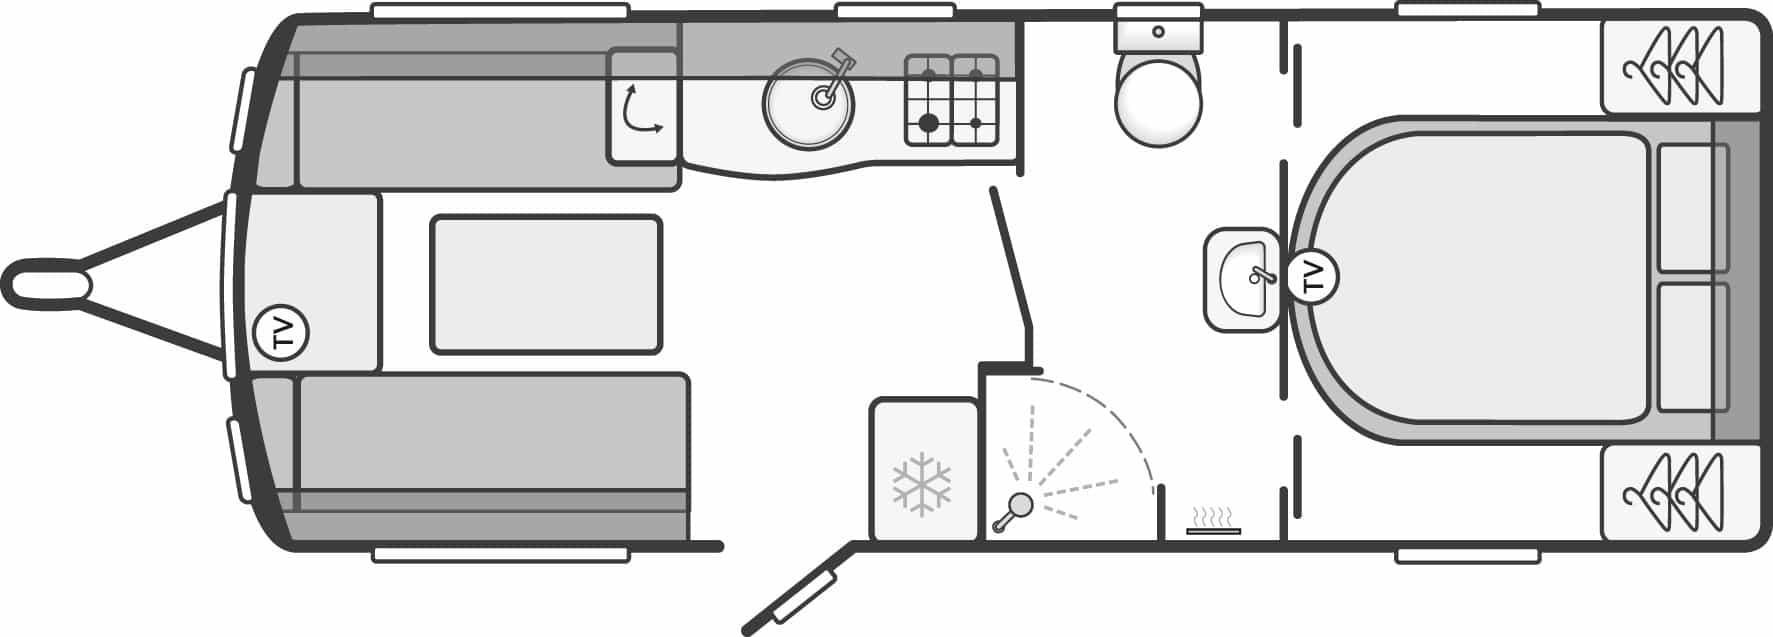 Sterling Elite 560 - 4 Berth, Island Fixed Bed, Centre Washroom, End Bedroom